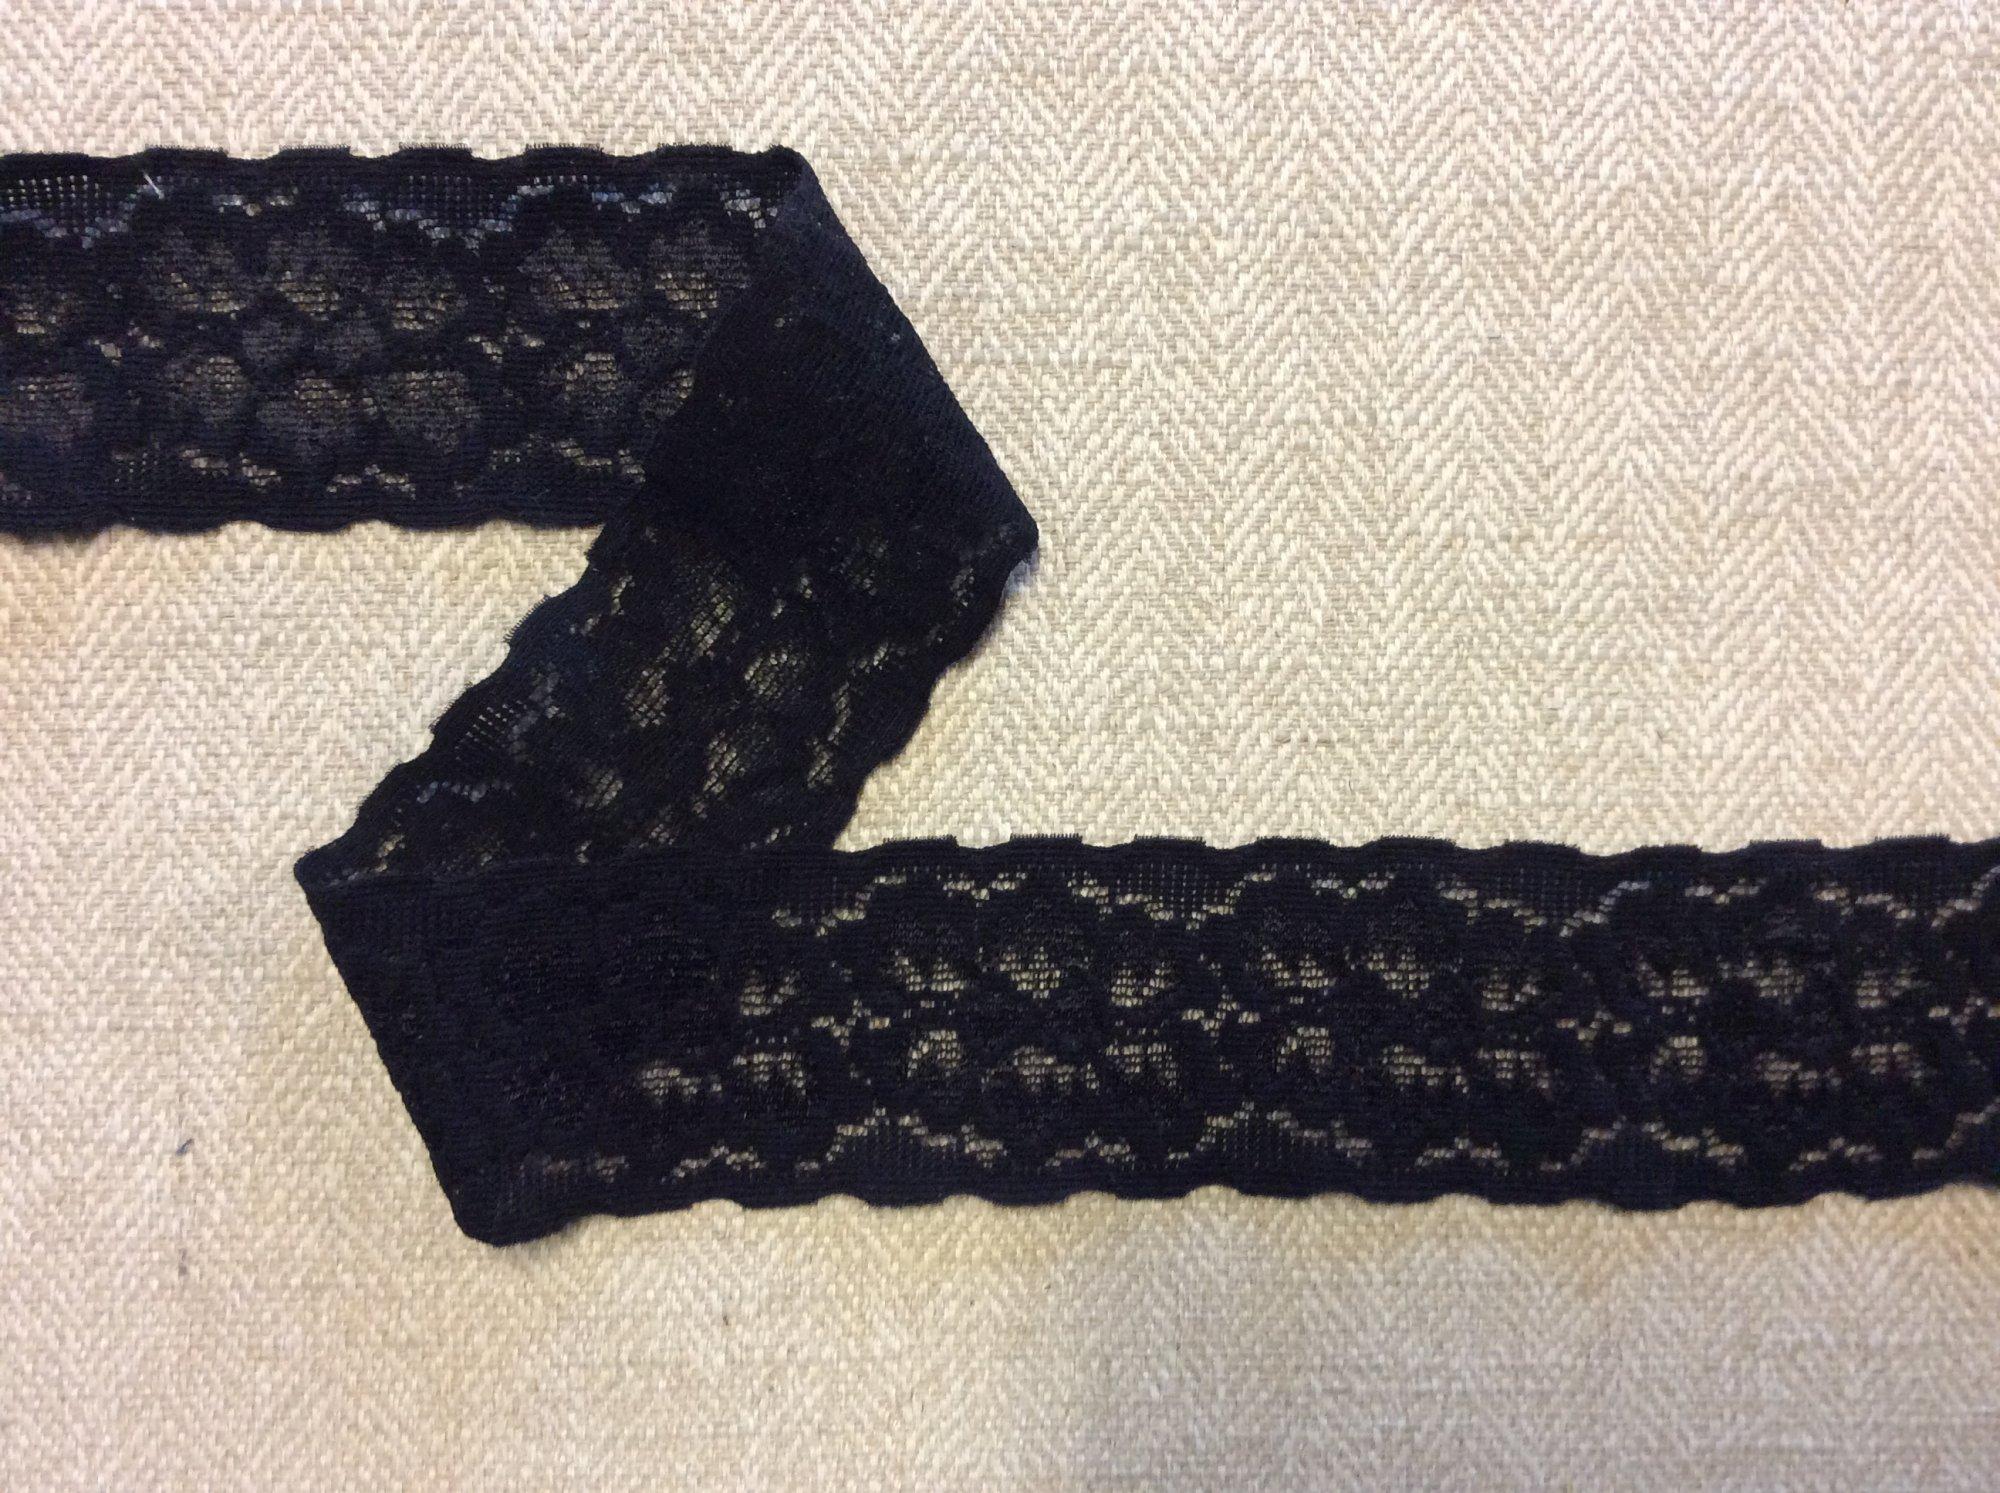 Black Floral Stretch Lace Ribbon Apparel Sewing Trim TRIM1023